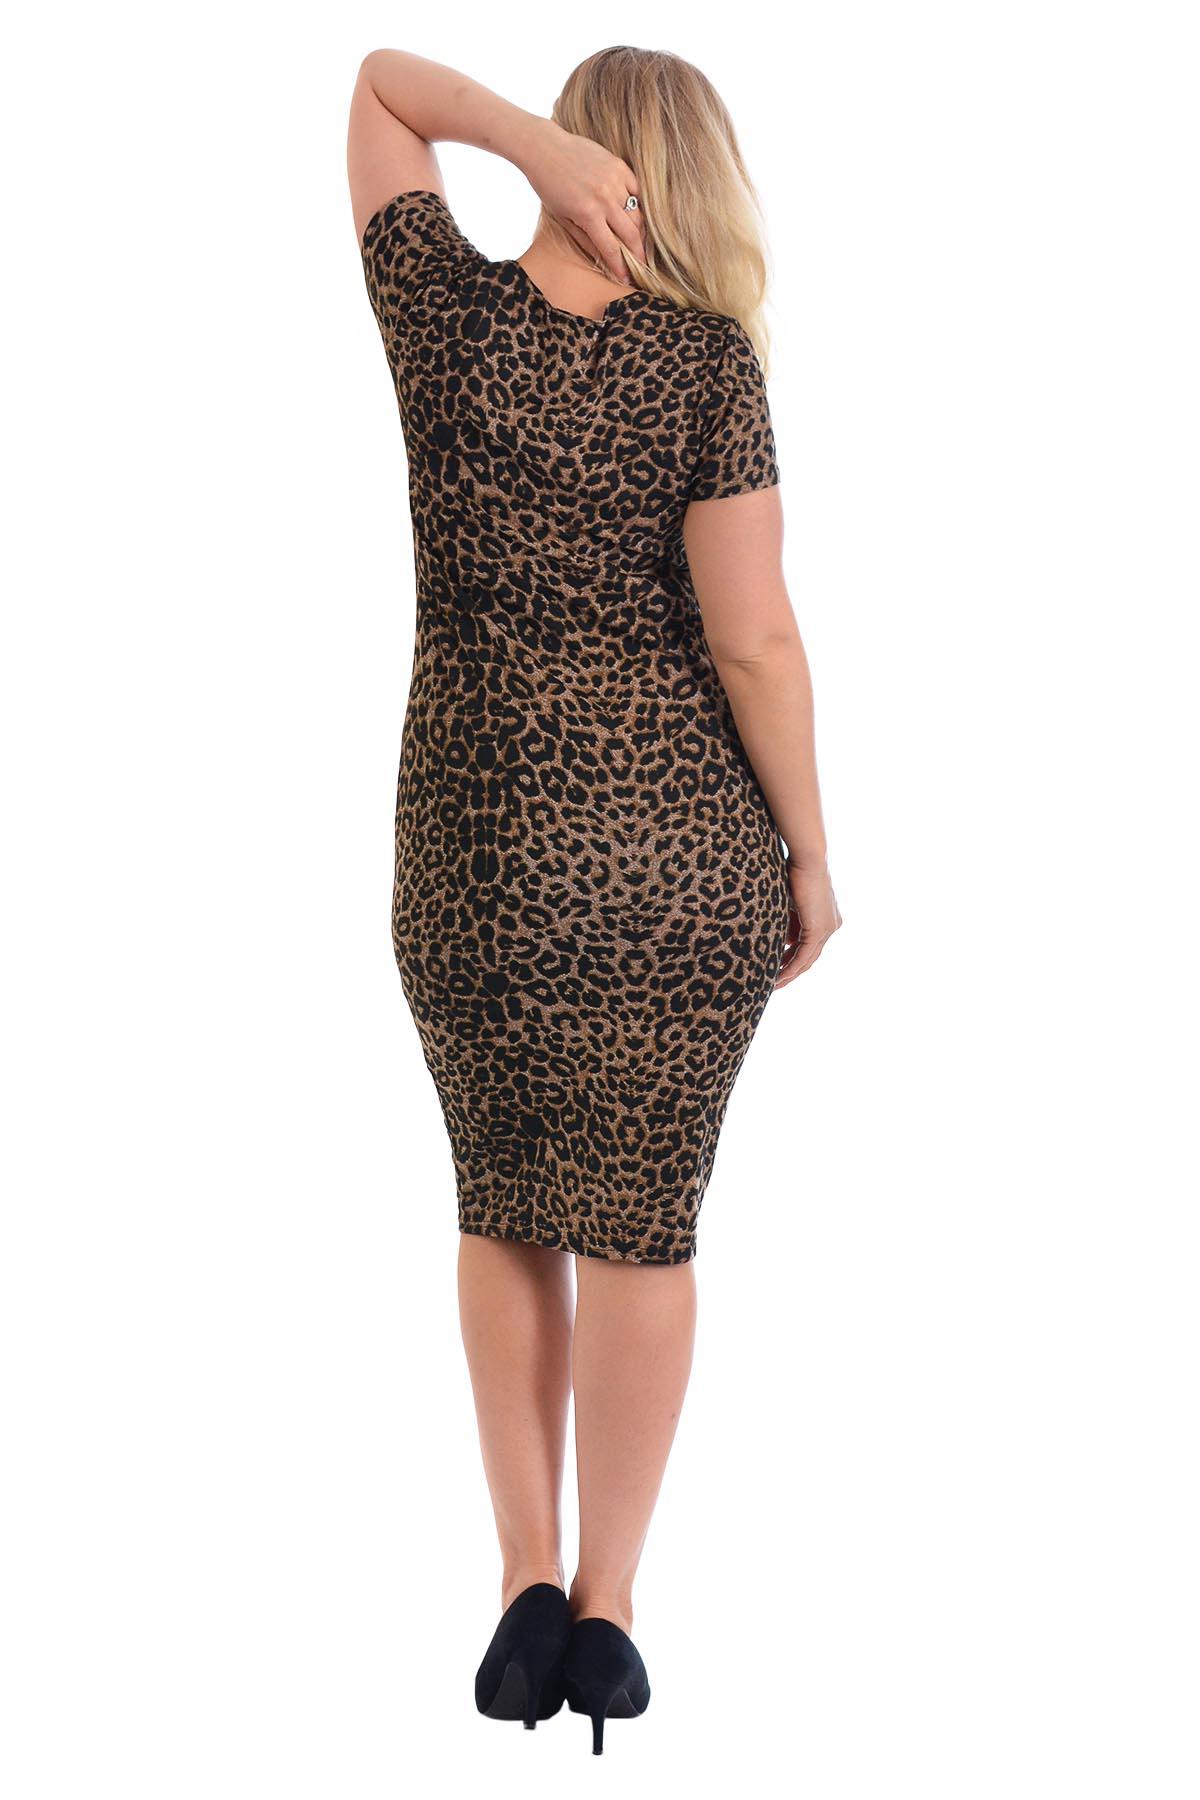 Neu Damen Kleid Übergröße Frau Tunika Ladeis Midi Bodycon Tier Leopard Nouvelle